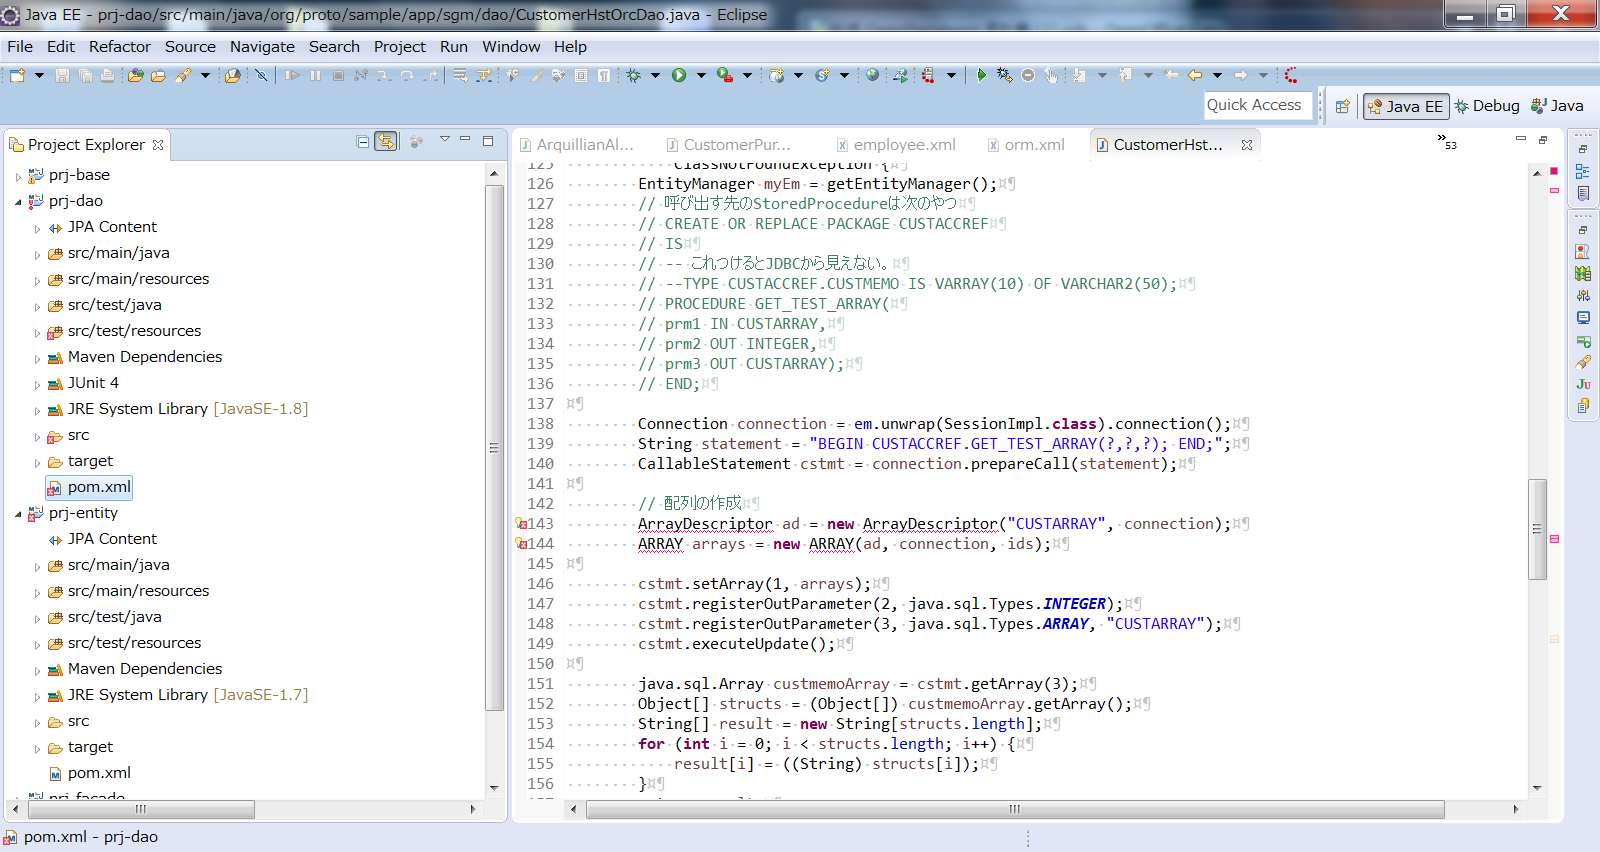 Eclipseでodbc6 jarを設定し、ArrayDescriptorを使用できるよう